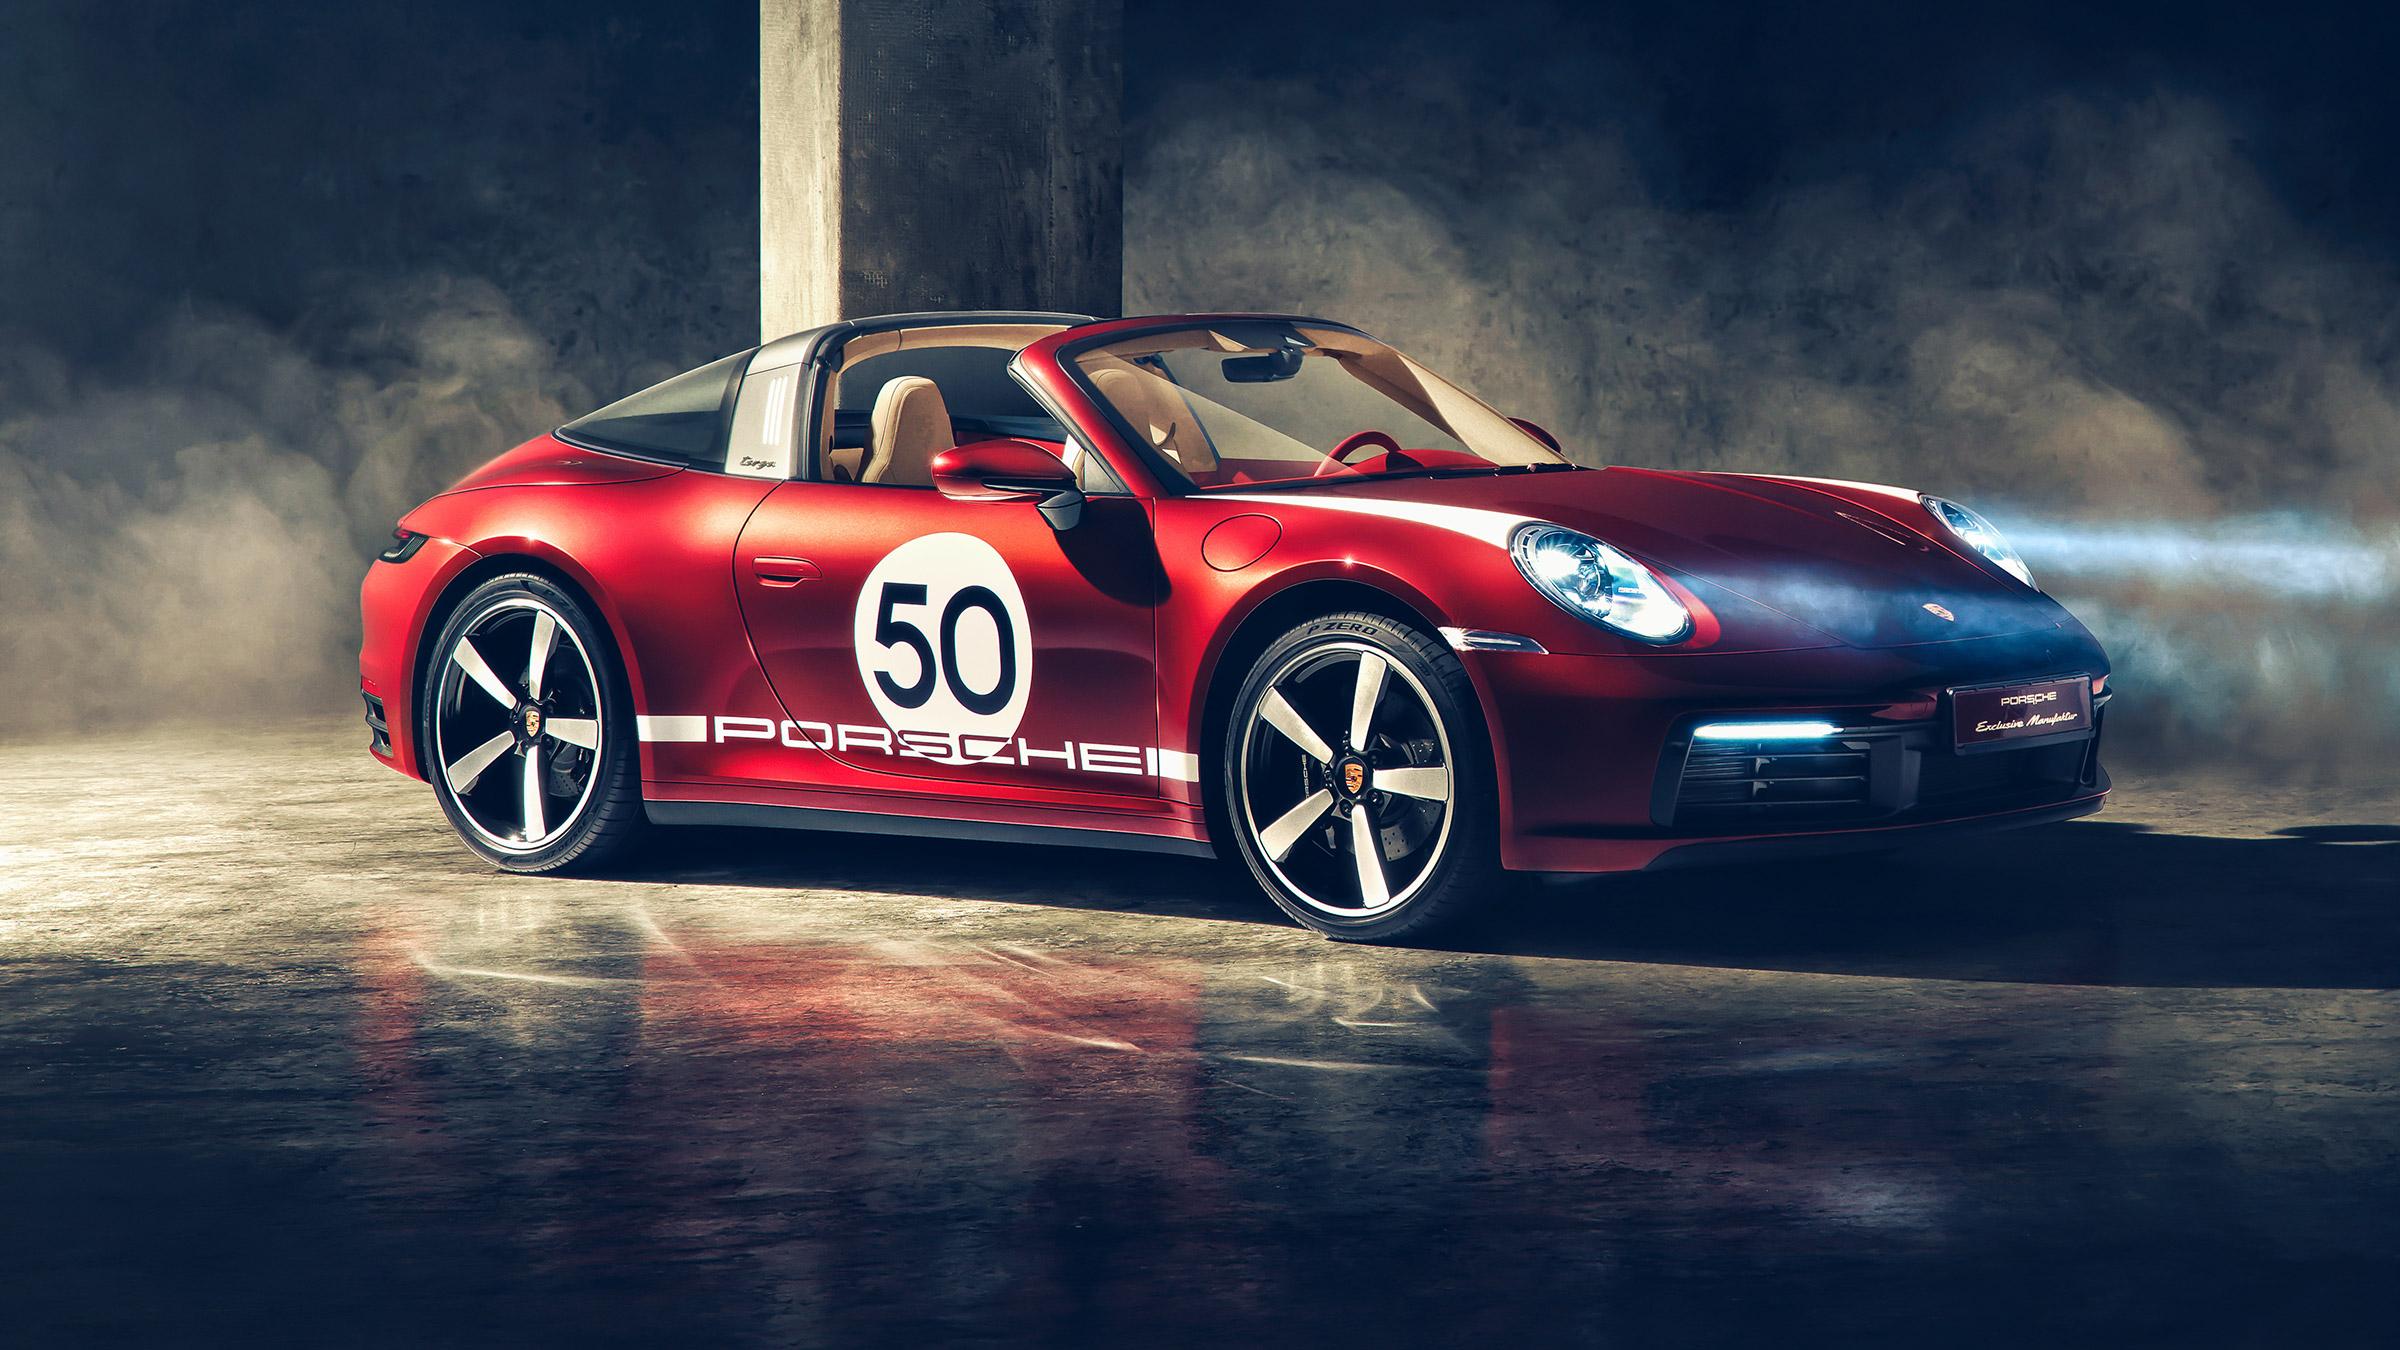 2020 Porsche 911 Targa 4s Heritage Design Edition Revealed Evo